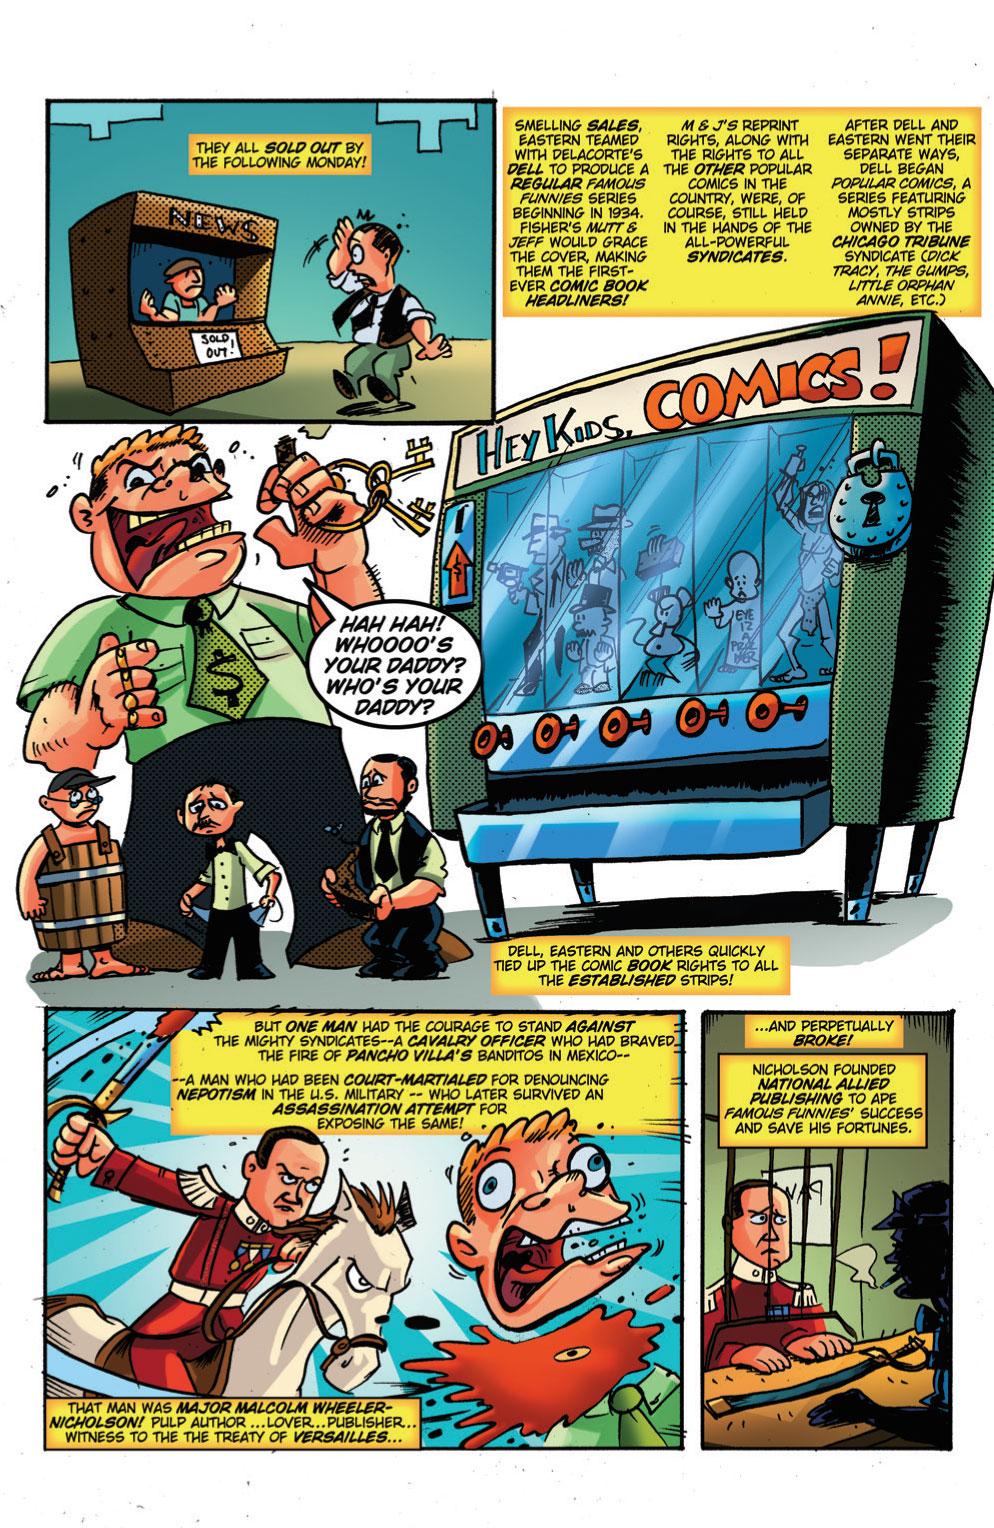 Comic Book History Of Comics #2 – Review